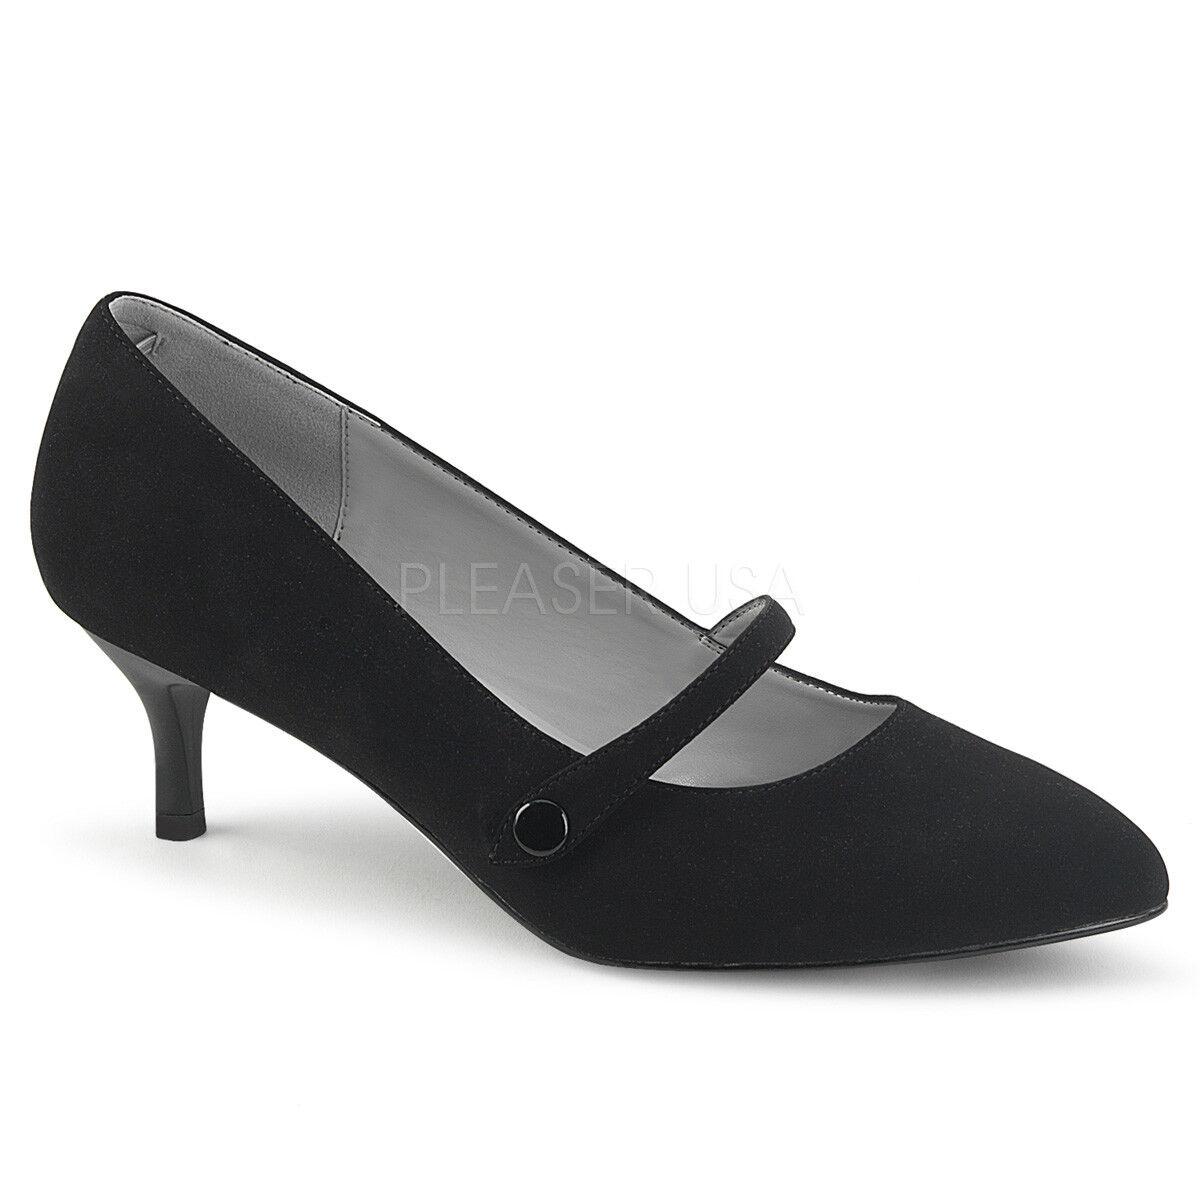 Black Suede Low Kitten Heels Vintage 1920s Flapper Girl Shoes size 12 13 14 15